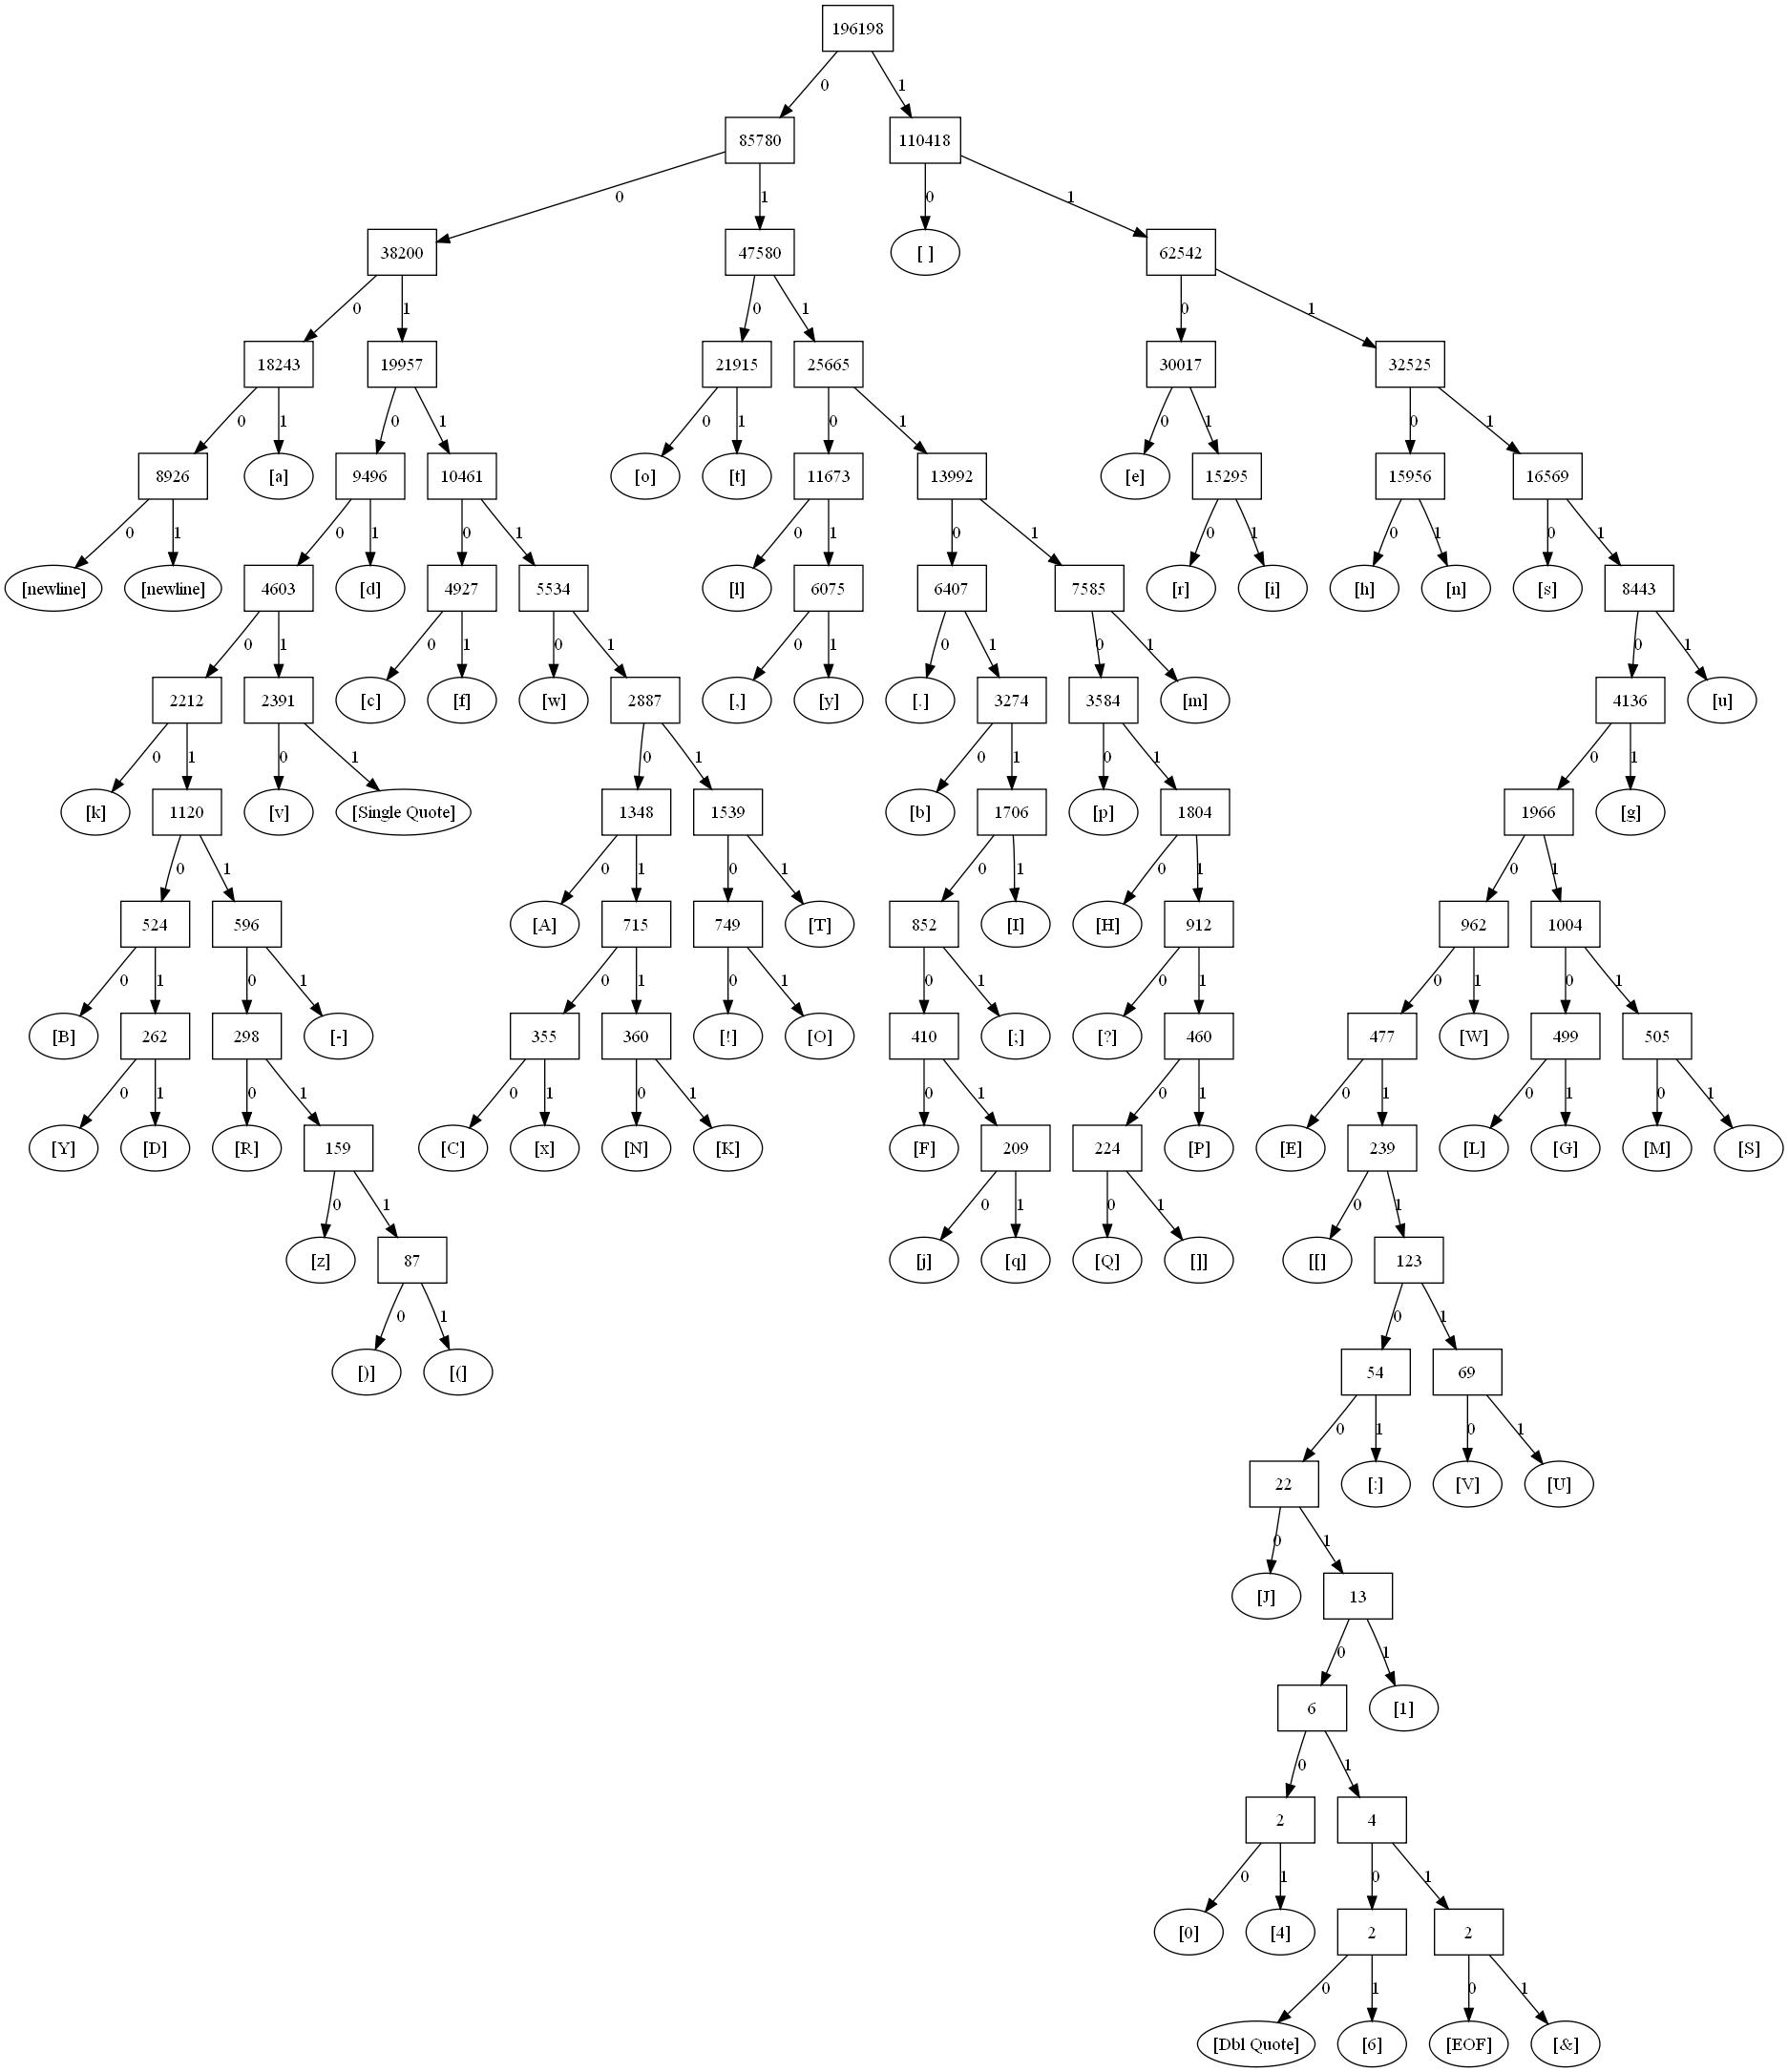 Cse 143 summer 2014 hamlet tree diagram ccuart Gallery